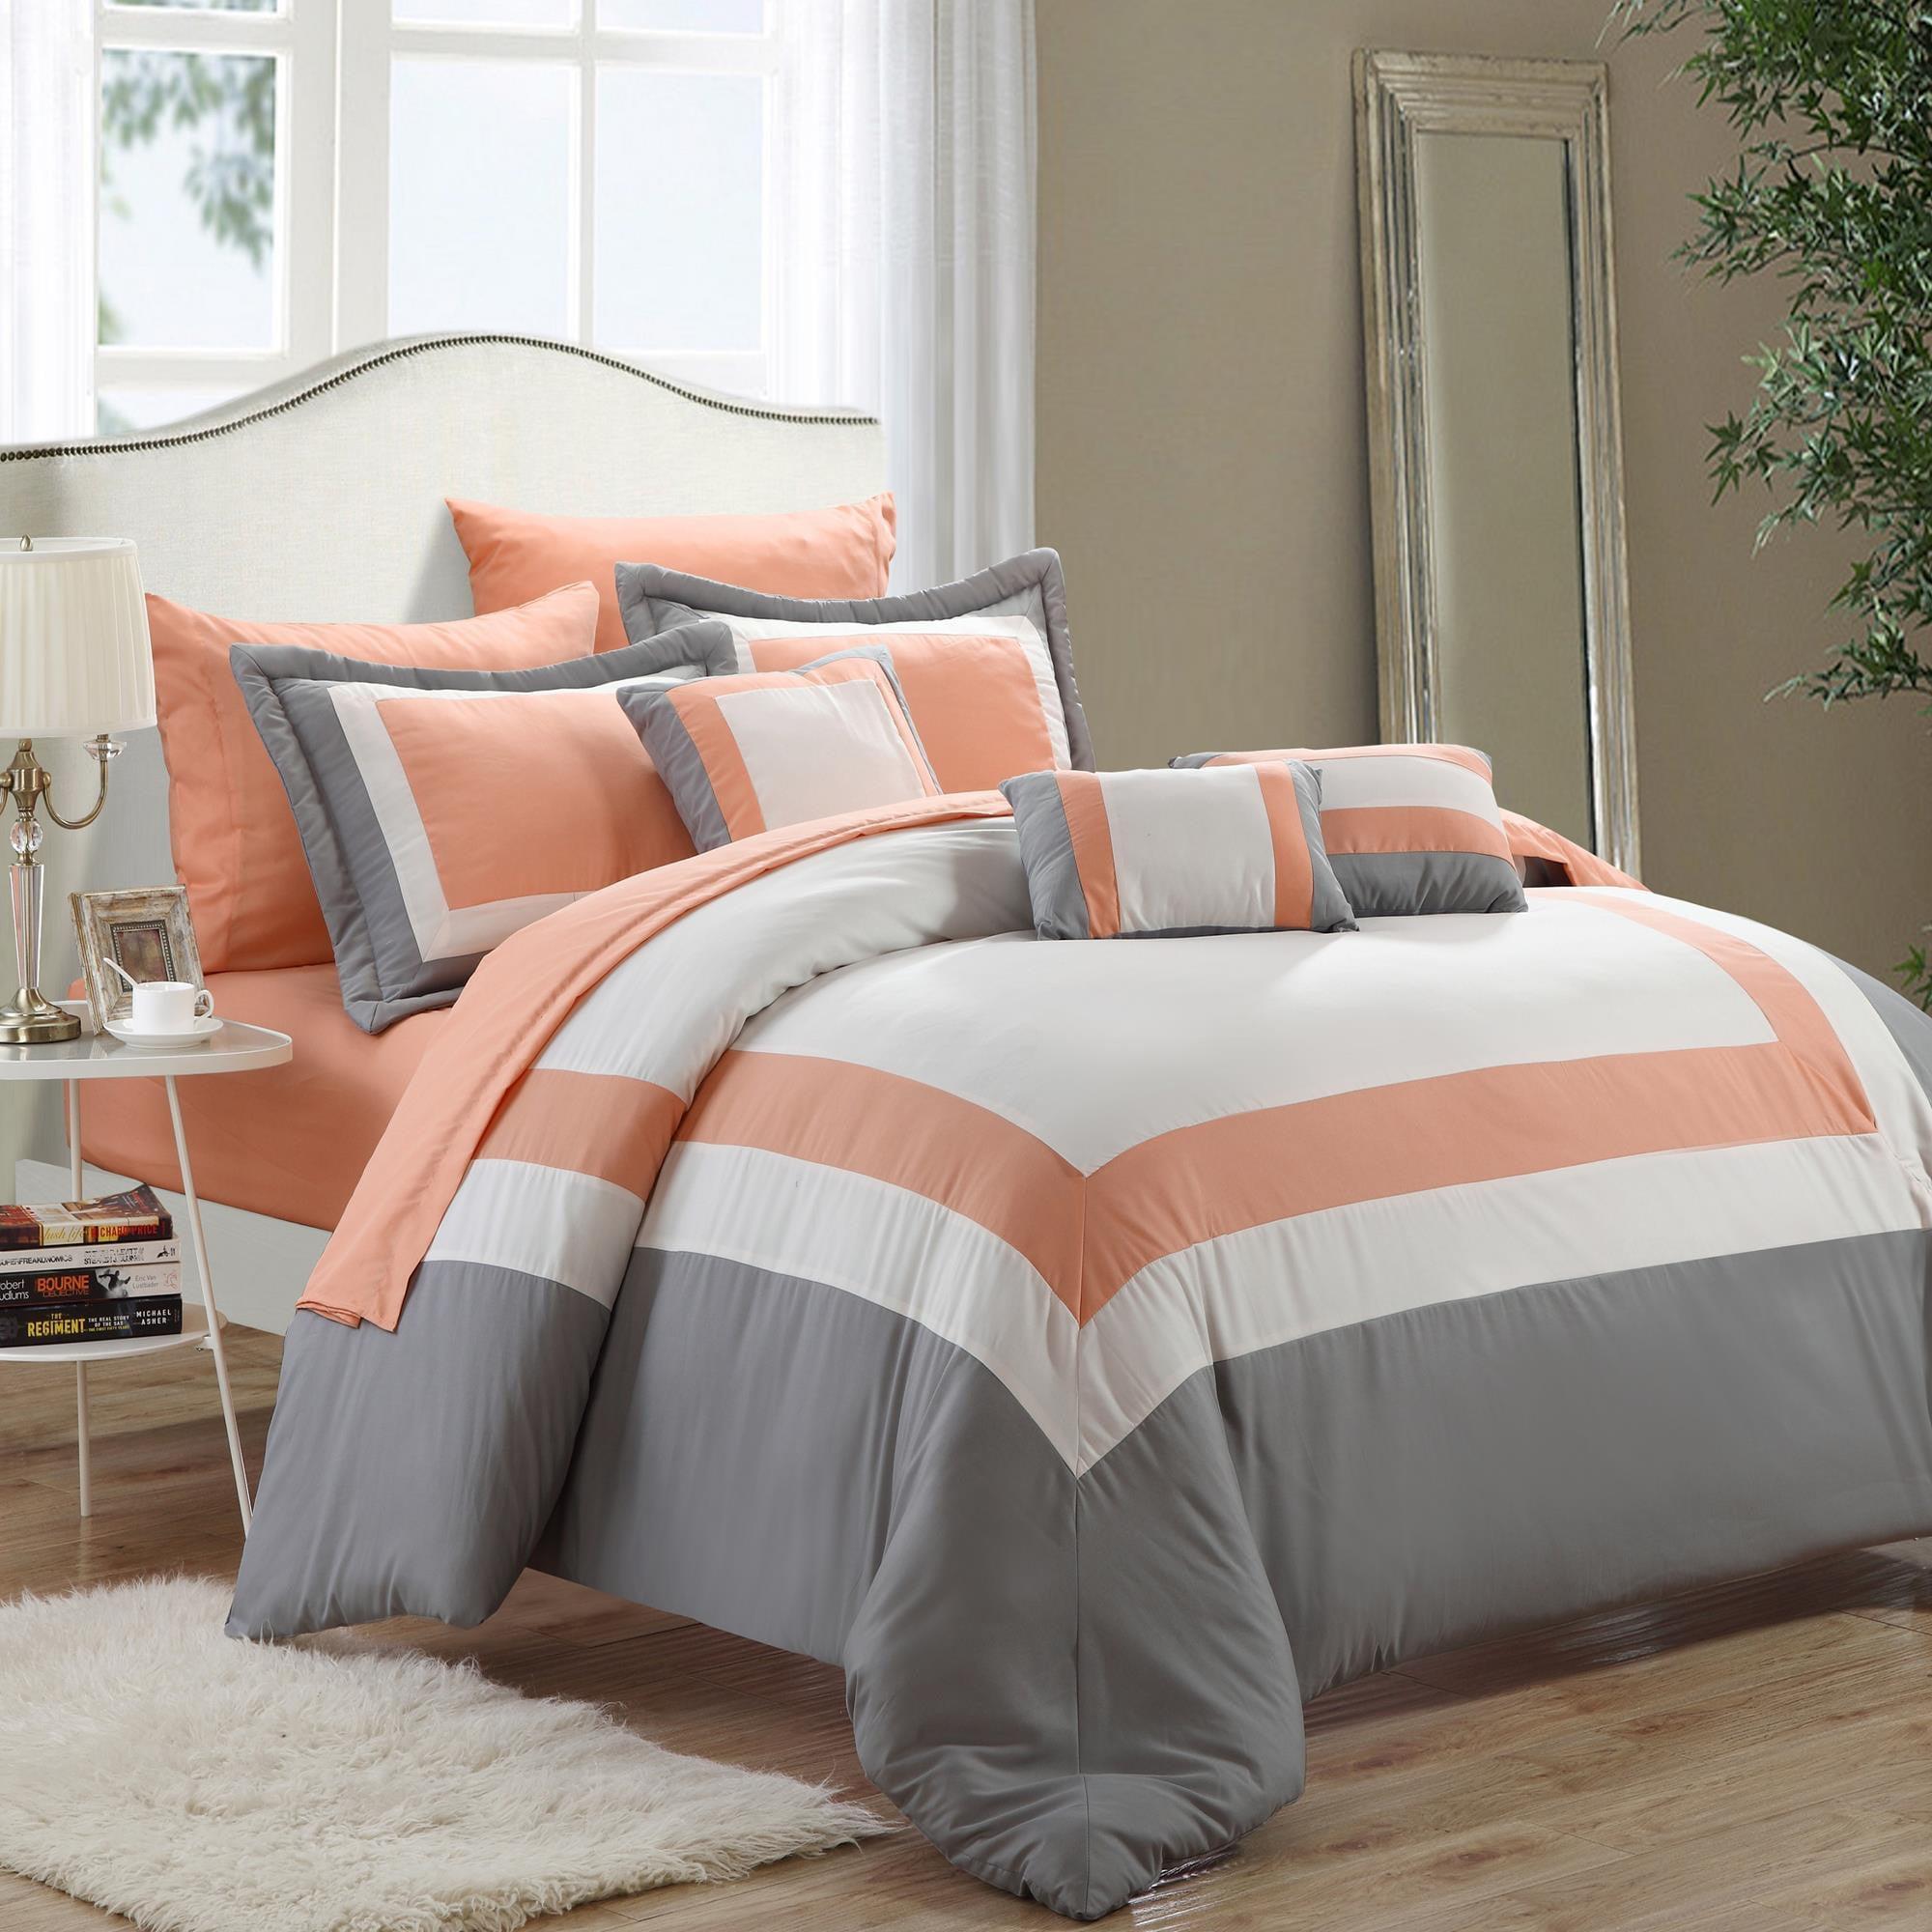 Peach And White Bedding Bedding Designs